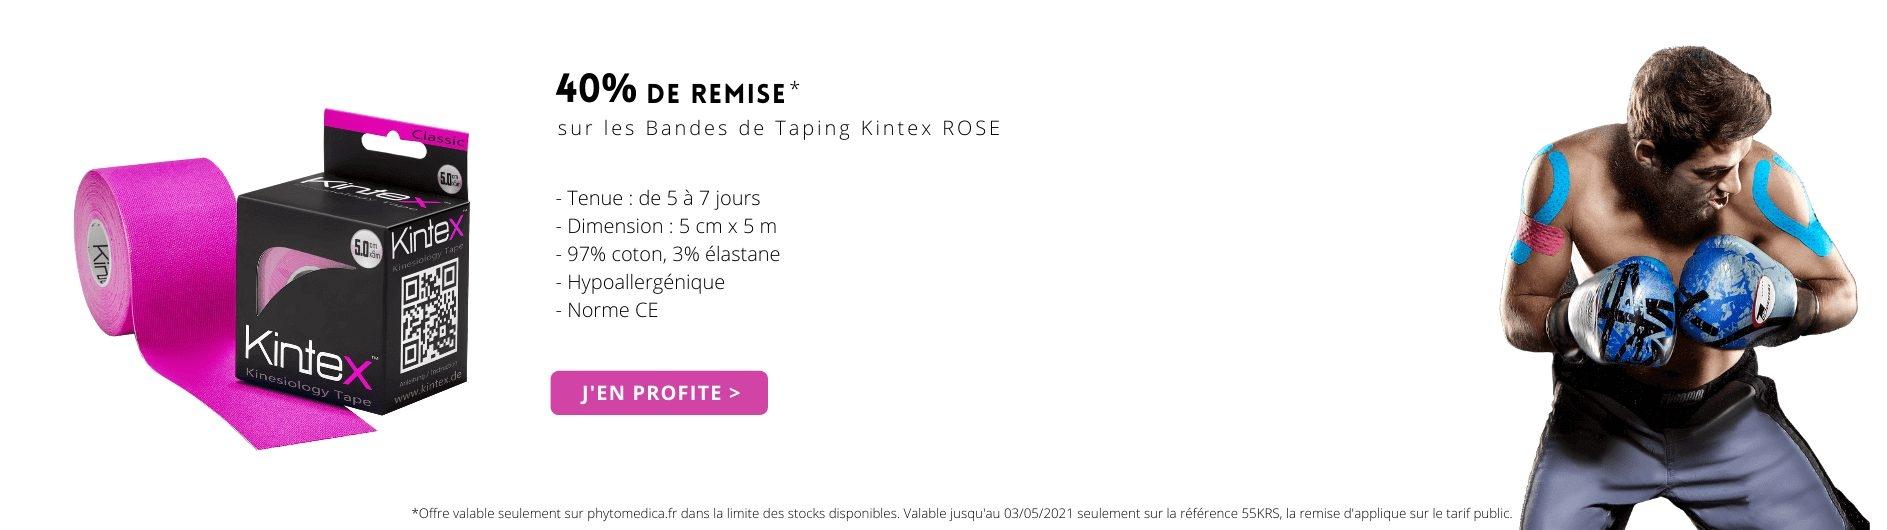 Offre bande de taping kintex rose